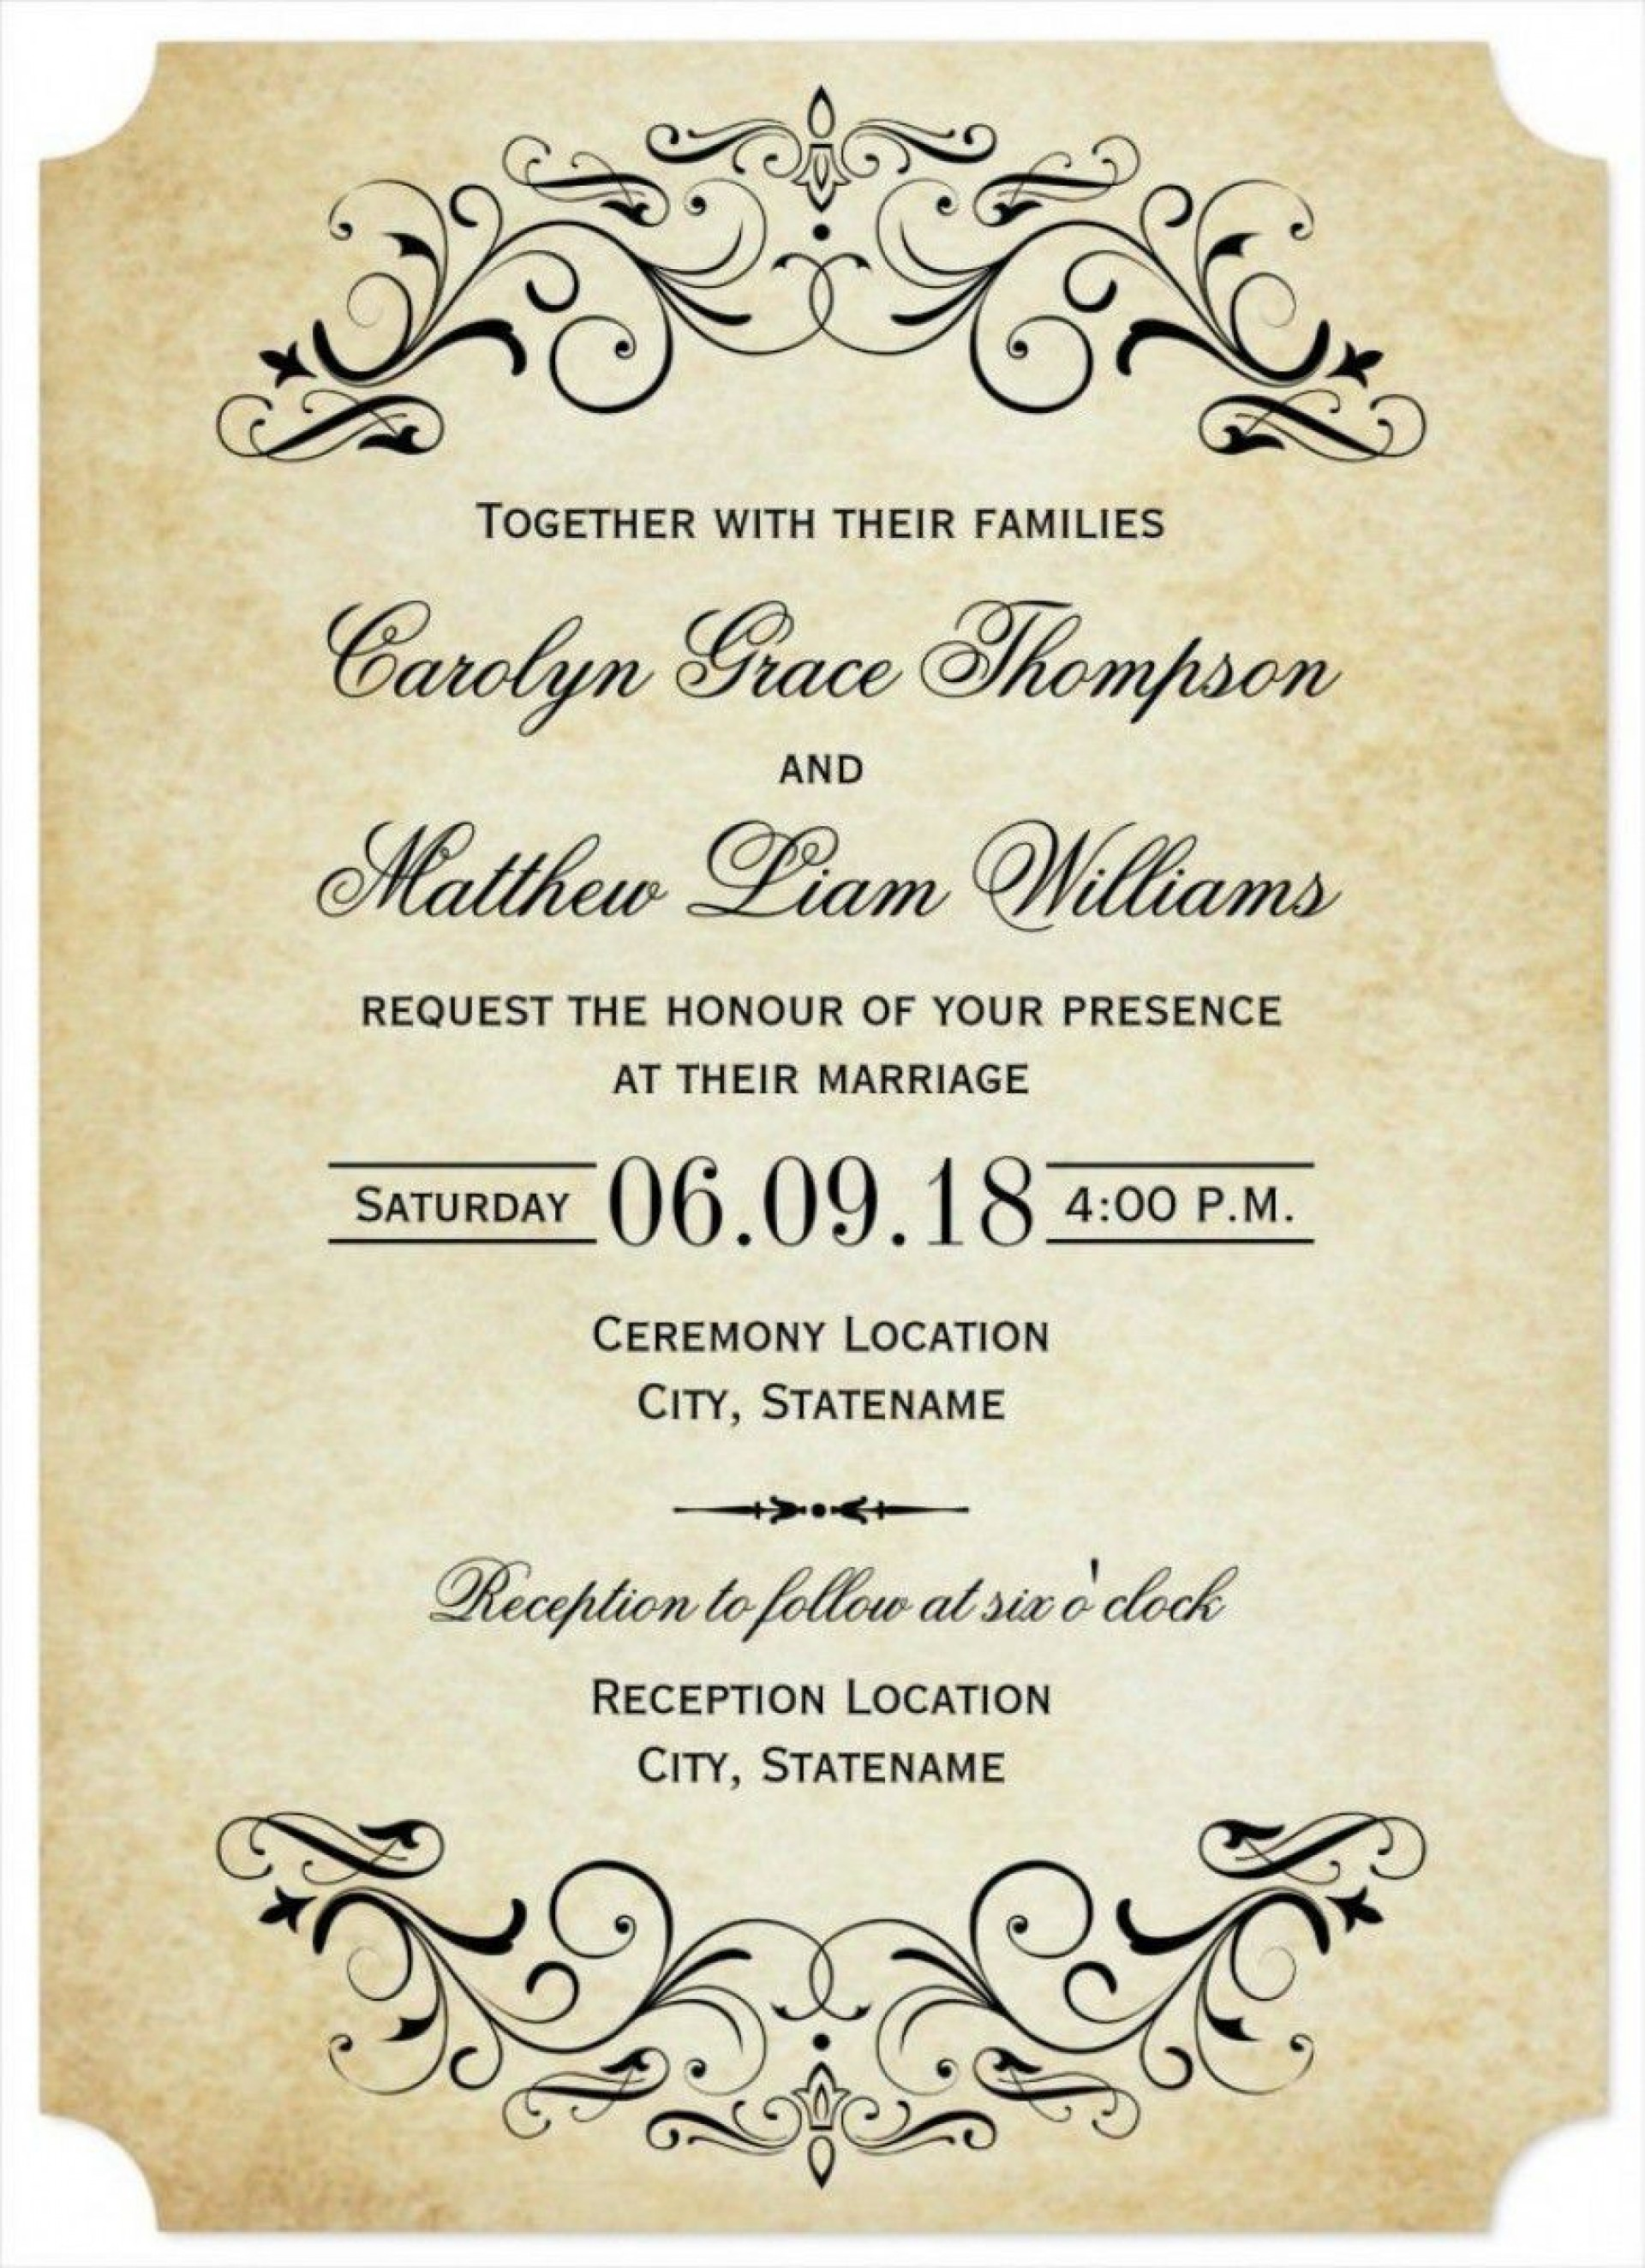 000 Stupendou Formal Wedding Invitation Wording Template High Resolution  Templates1920